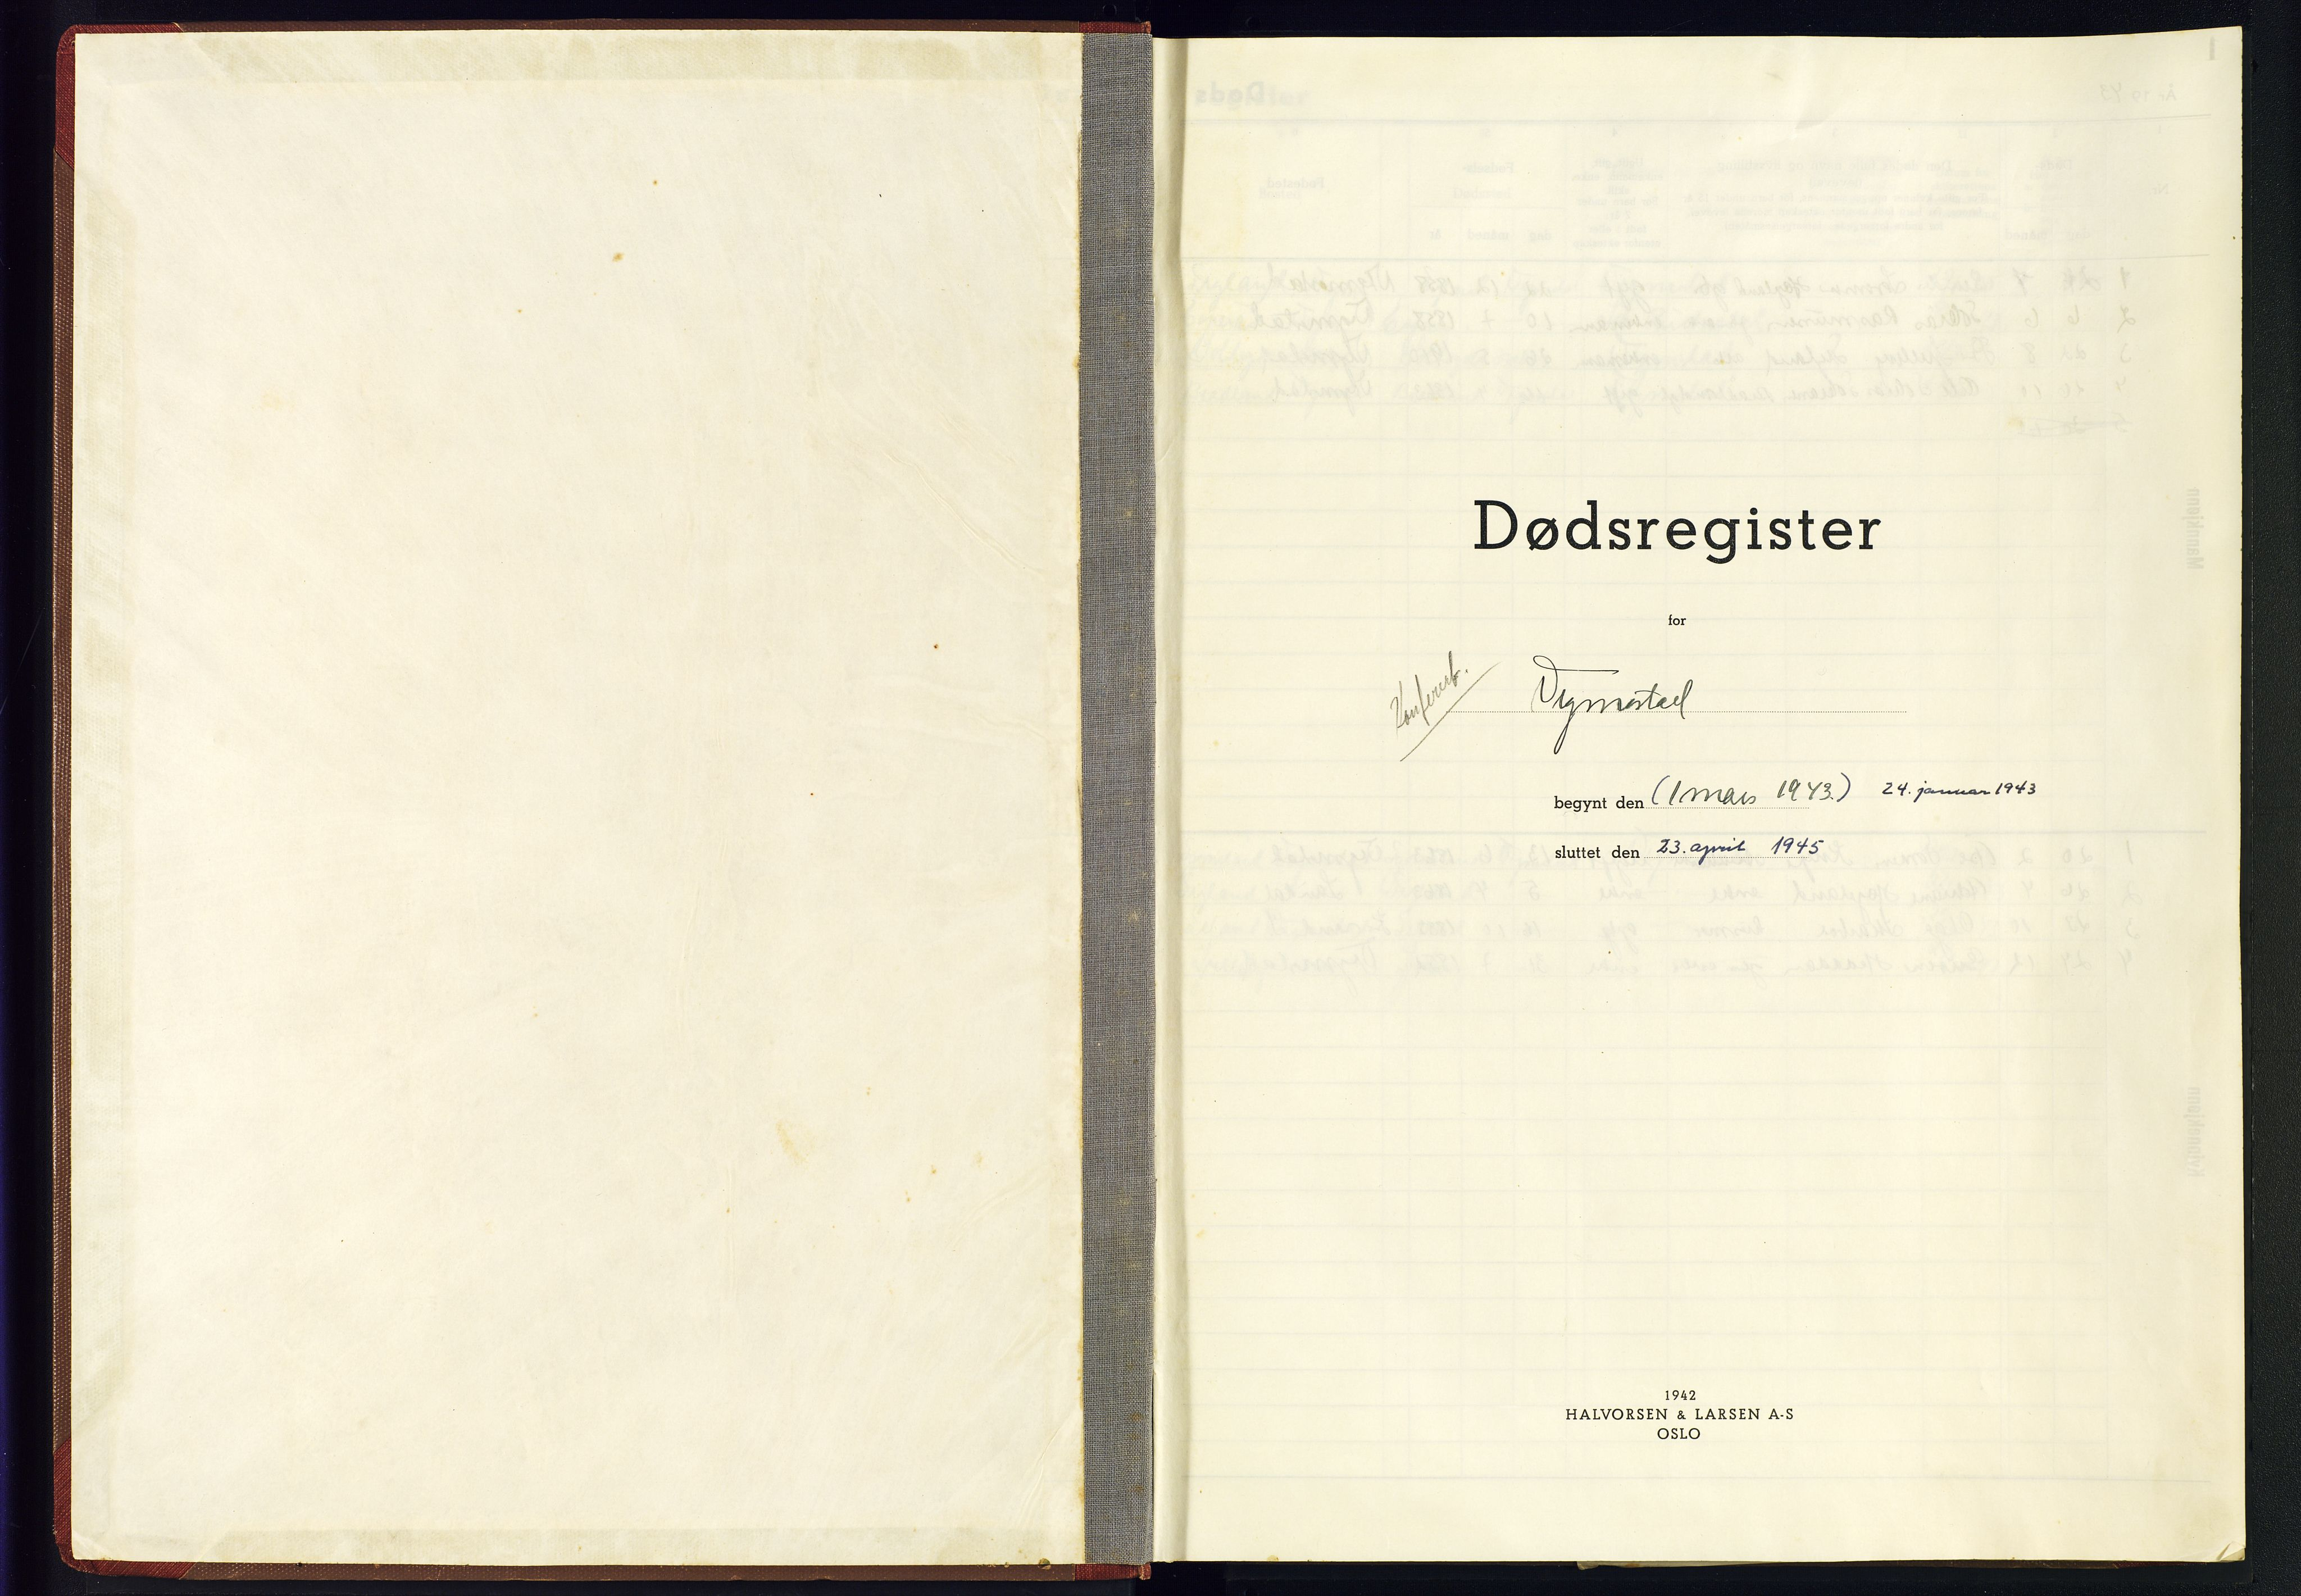 SAK, Nord-Audnedal sokneprestkontor, J/Jb/L0003: A-VI-3 - Dødsfallsregister Vigmostad, 1943-1945